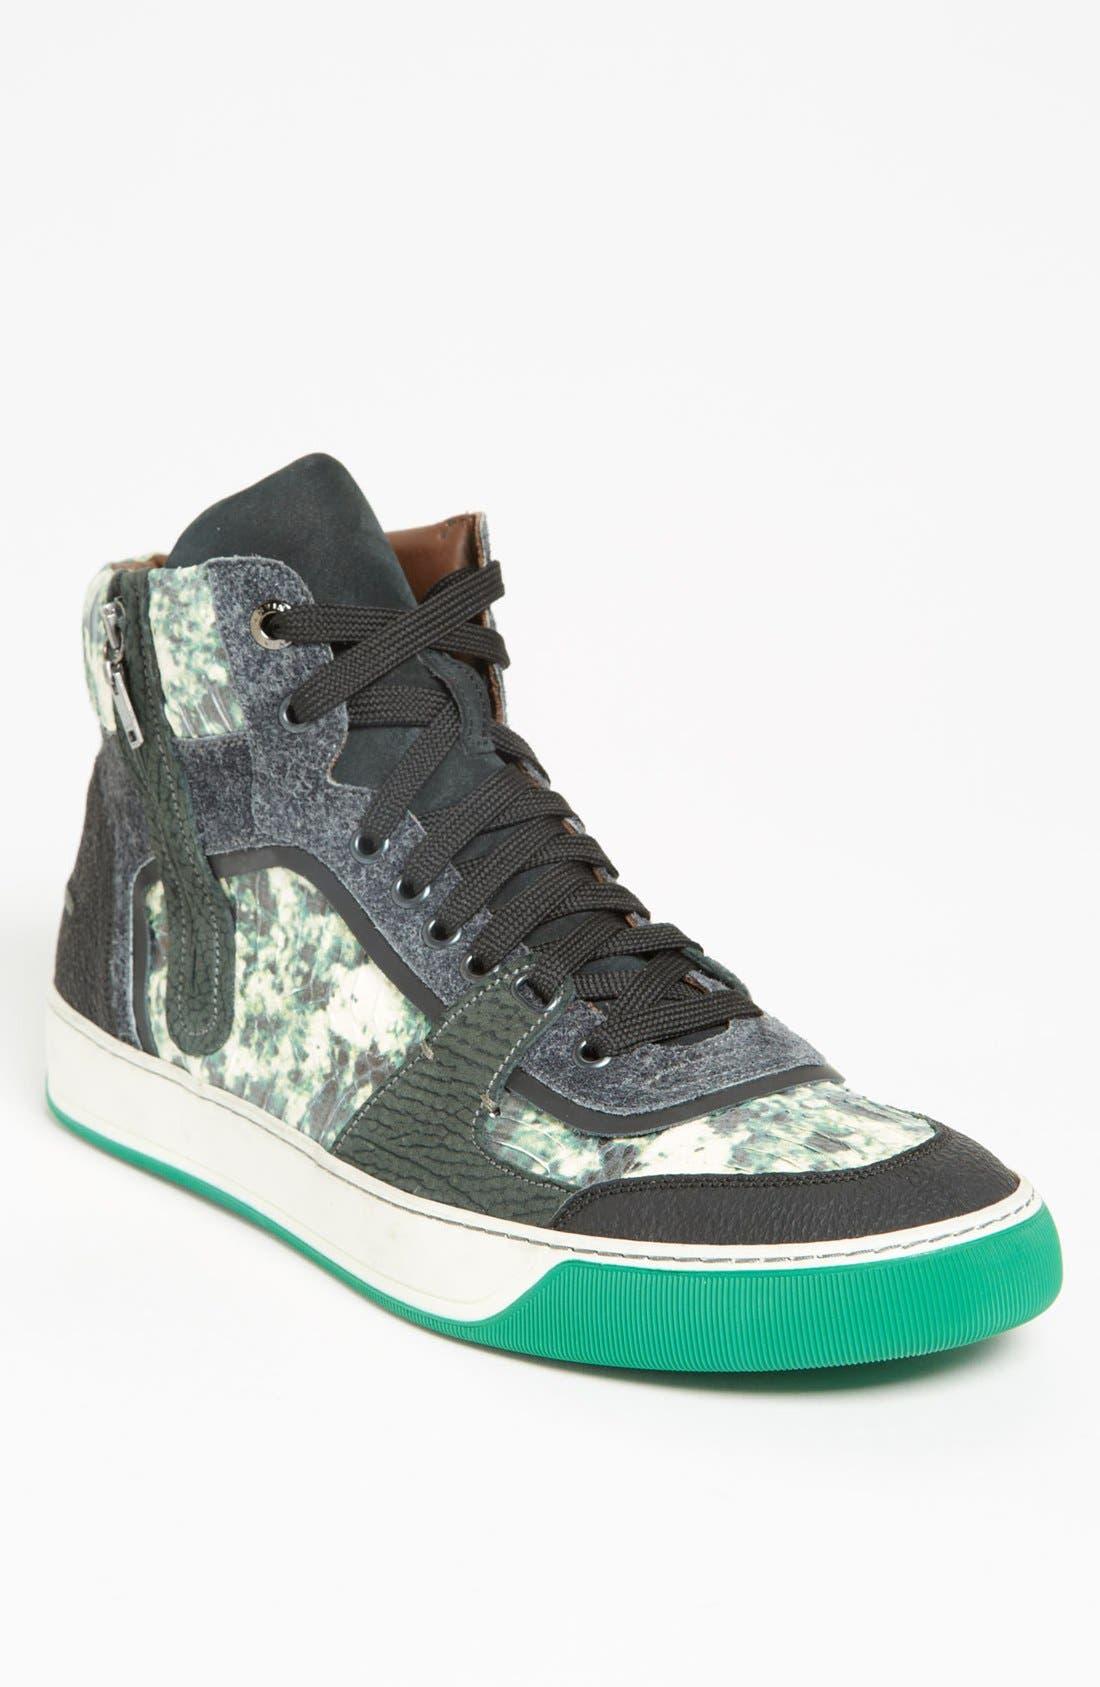 LANVIN, High Top Sneaker, Main thumbnail 1, color, 300